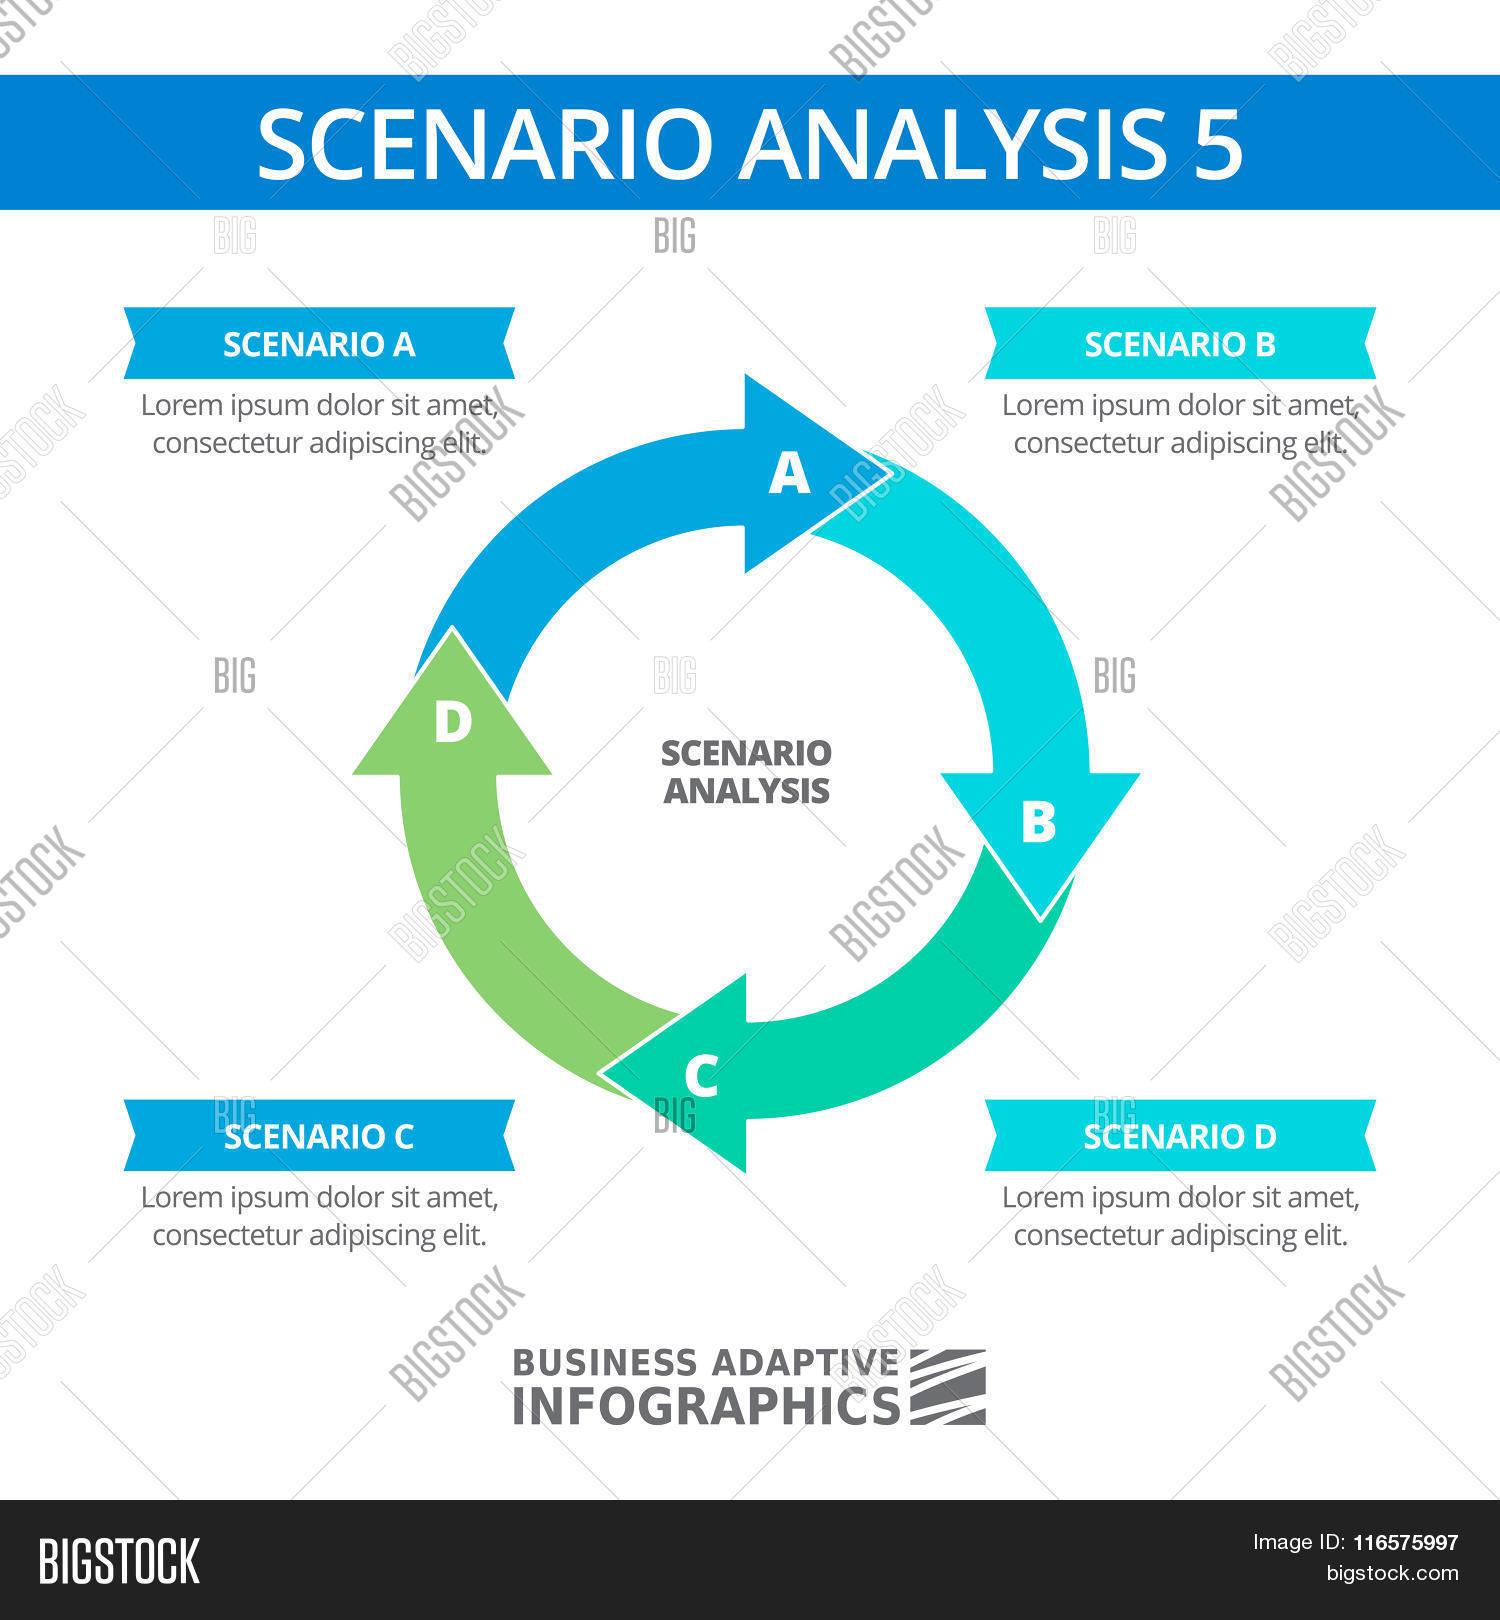 Scenario Analysis Vector & Photo (Free Trial) | Bigstock